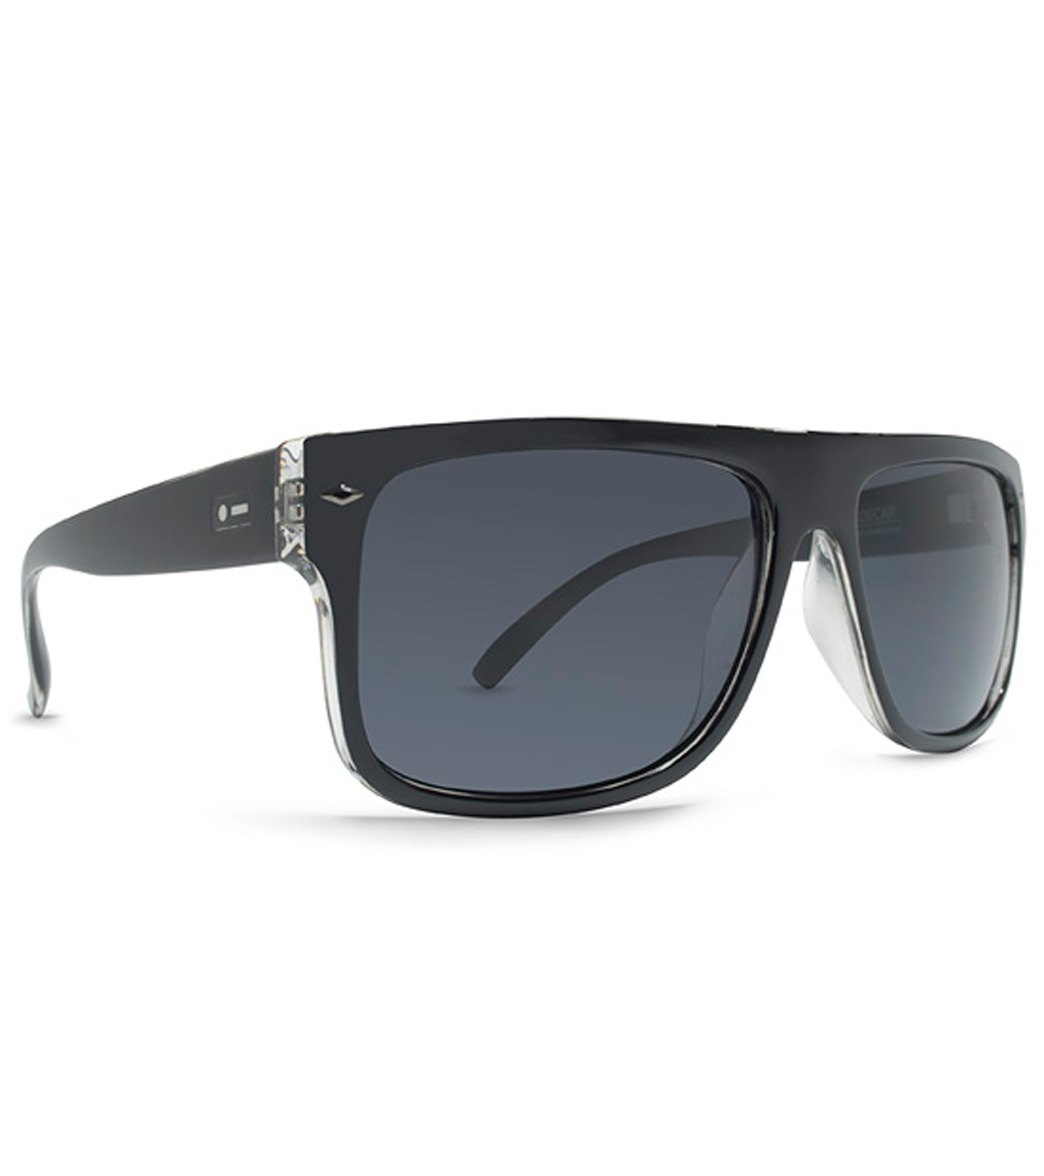 86b9ab2da5 Dot Dash Sidecar Sunglasses at SwimOutlet.com